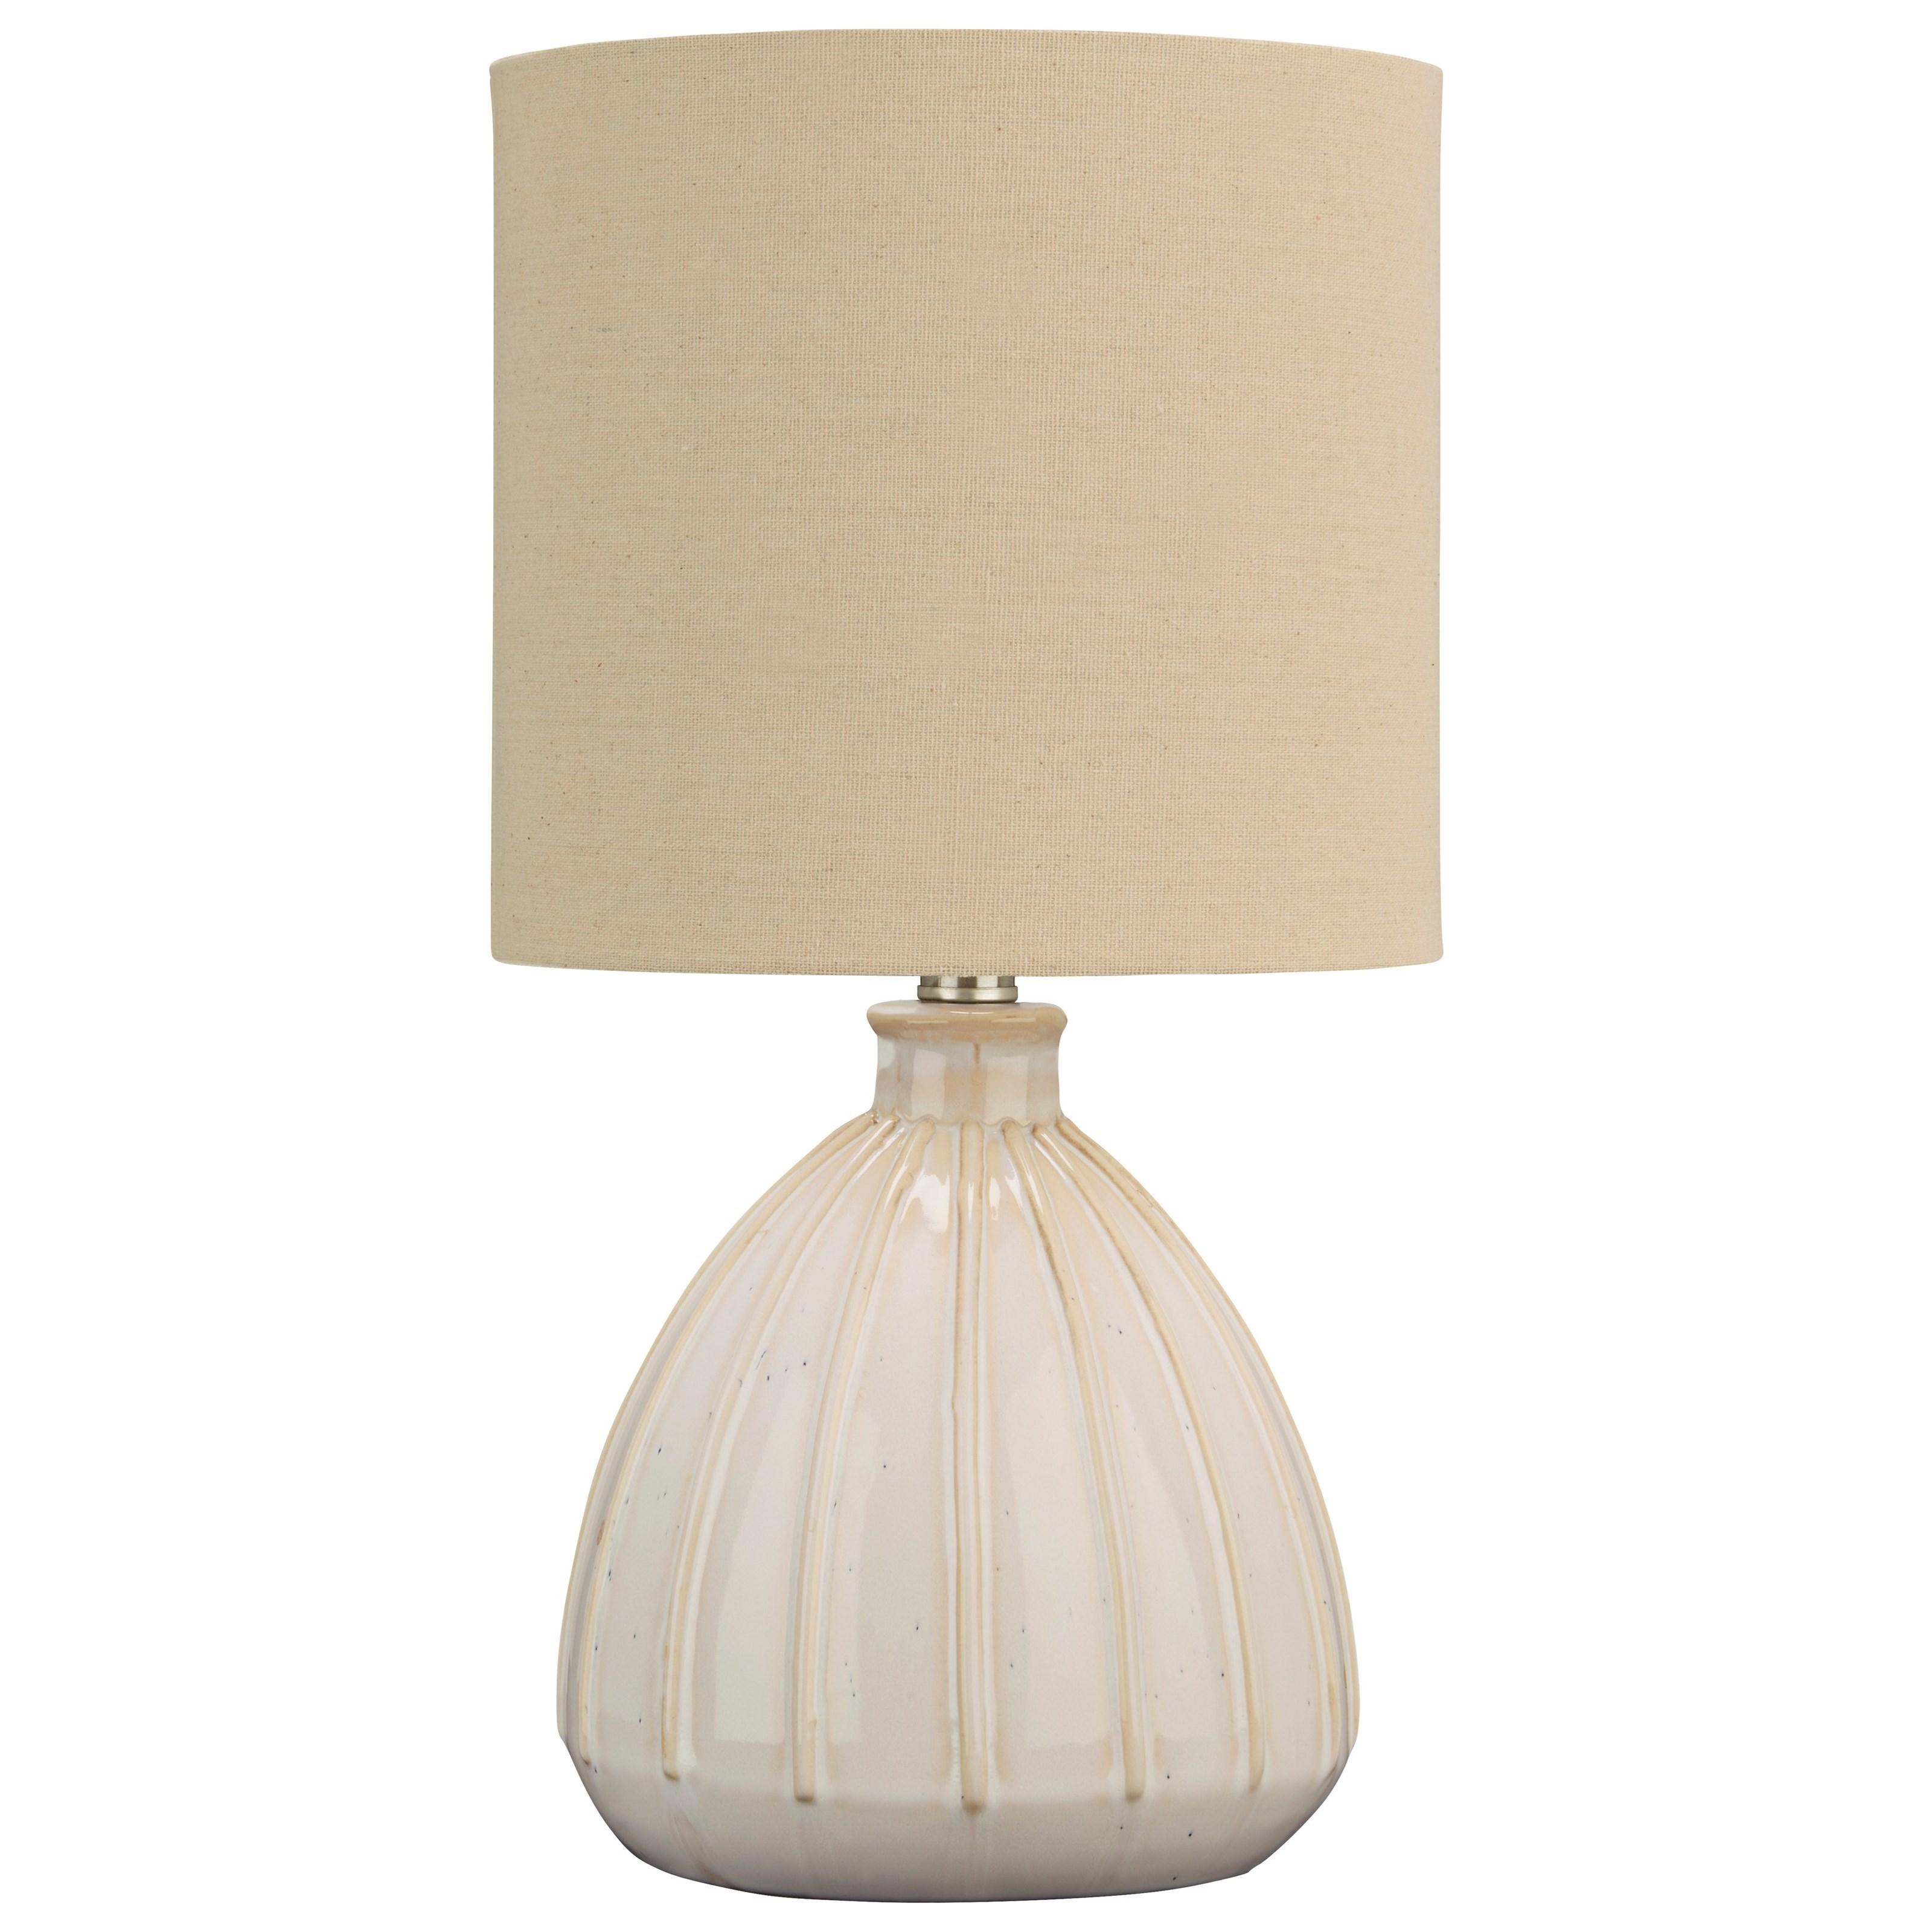 Grantner Off White Ceramic Table Lamp